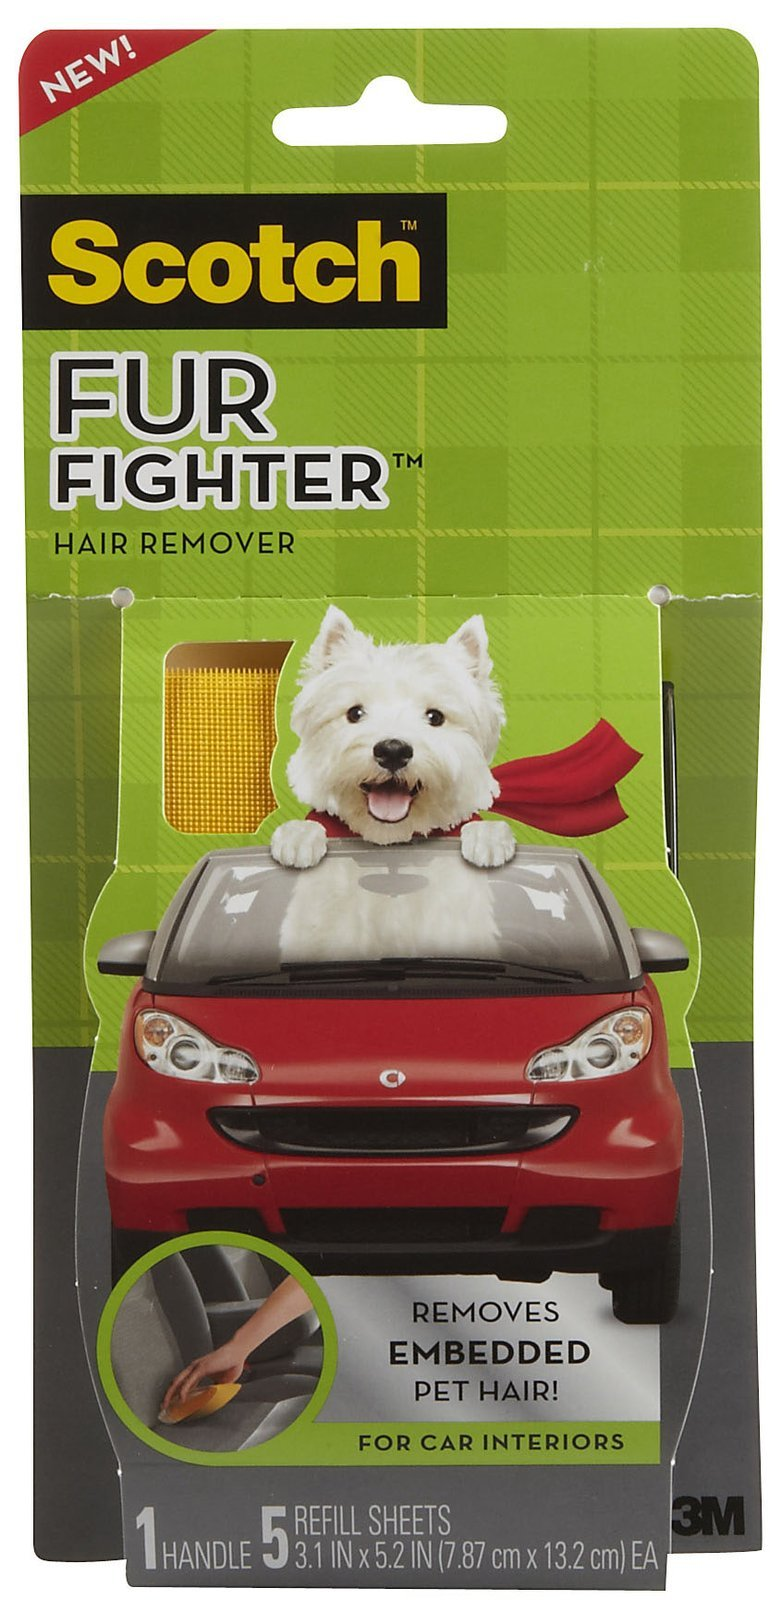 Scotch(TM) Fur Fighter(TM) Hair Remover by Scotch Brands